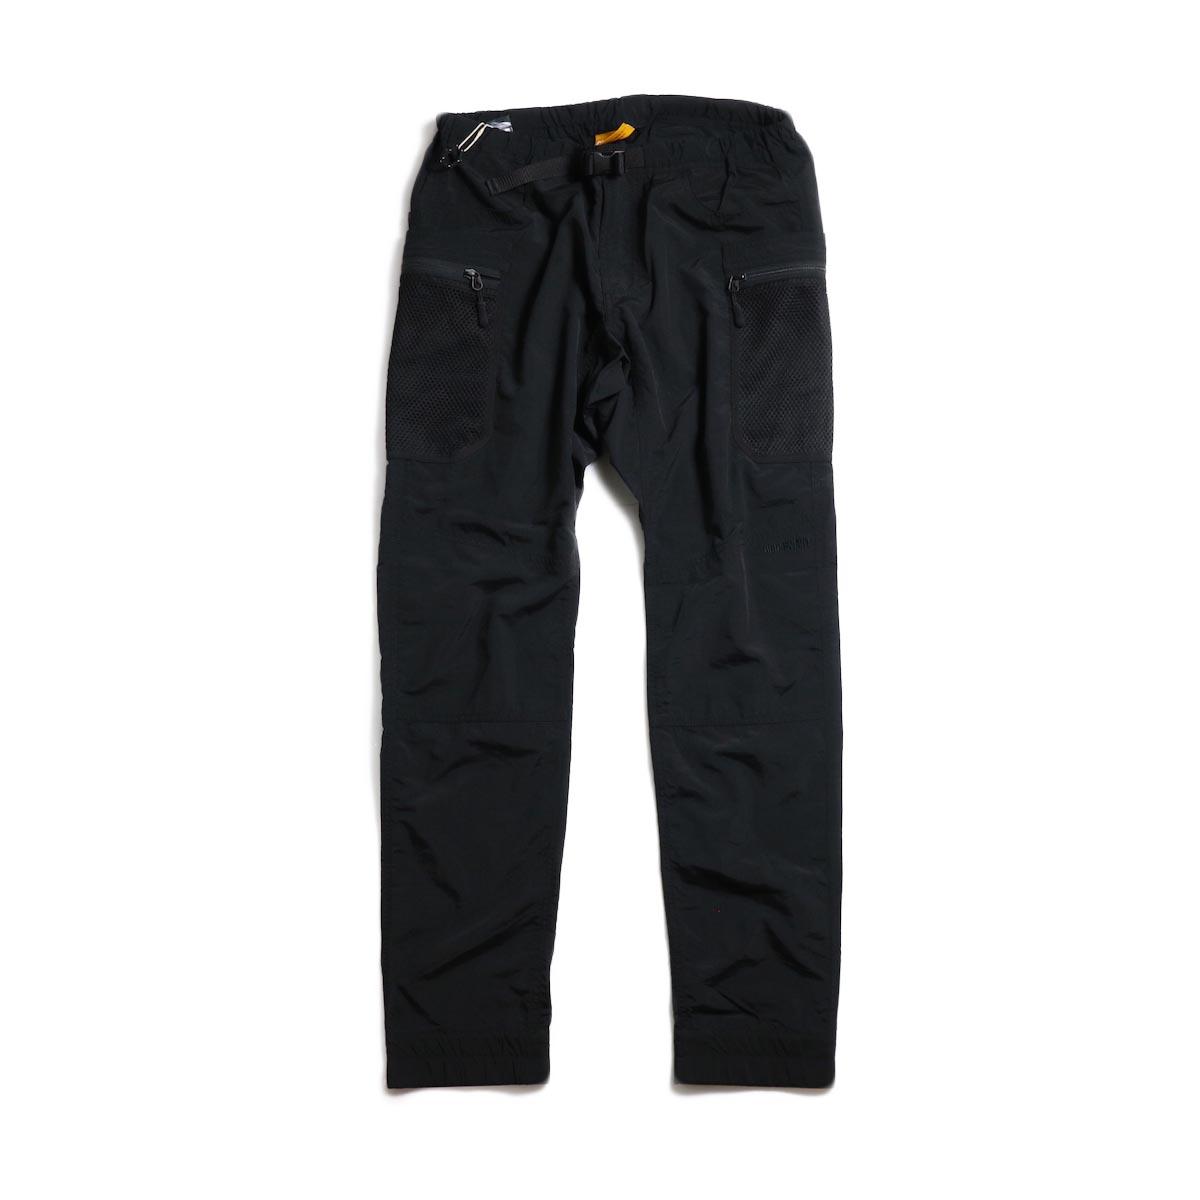 HOBO / SUPPLEX® Nylon Gardener Pants by GRIP®SWANY -Black